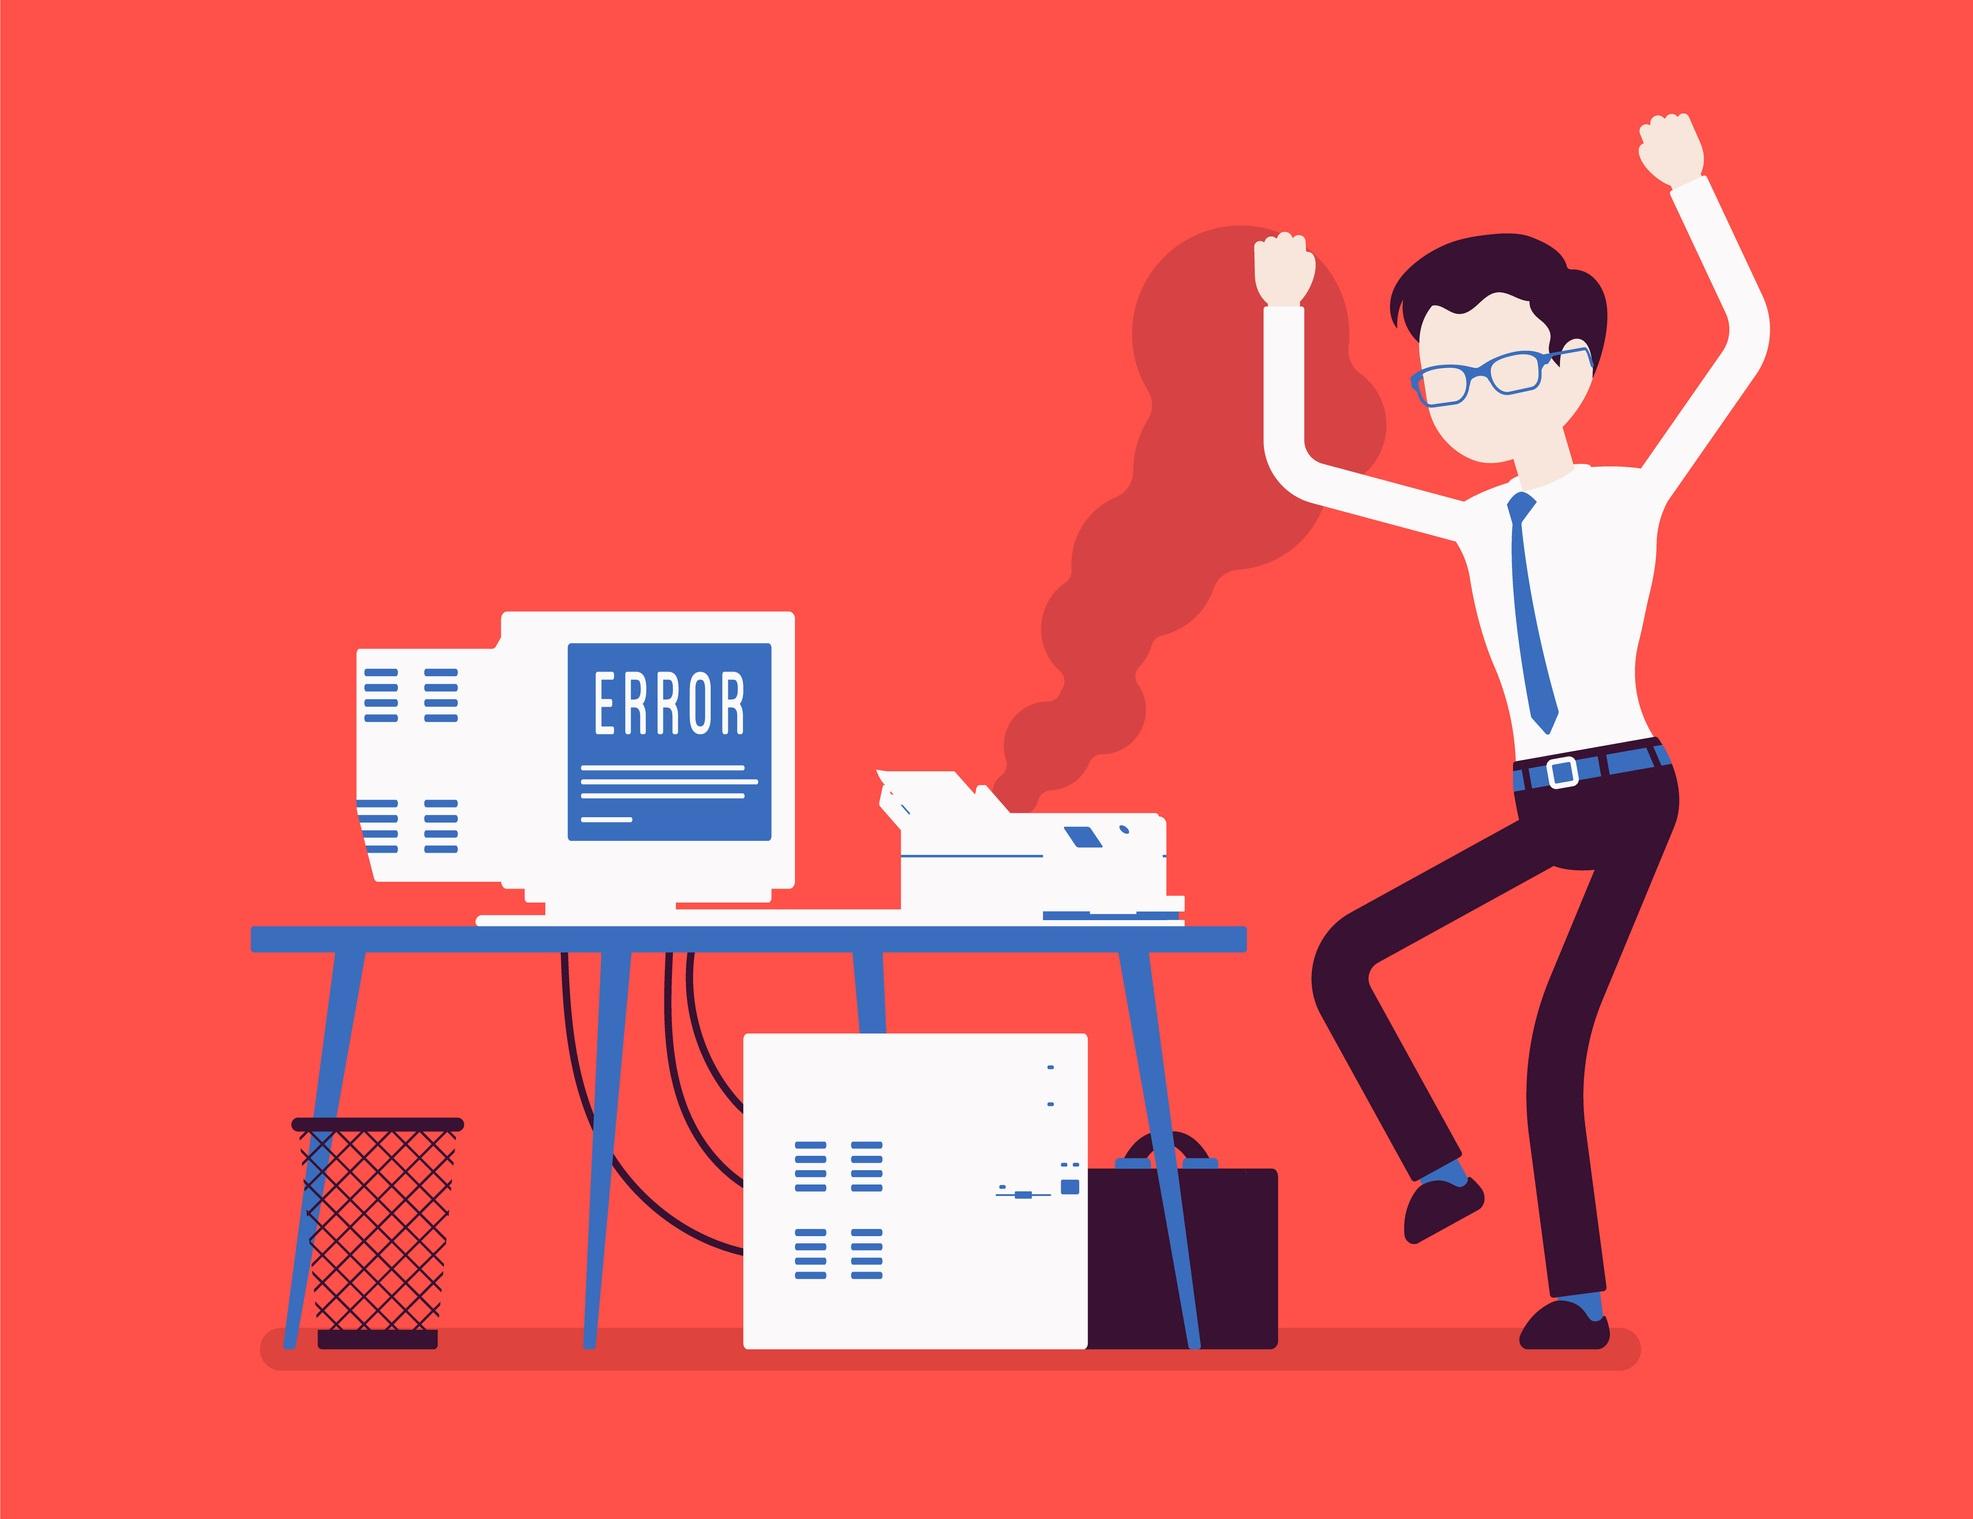 computer with error